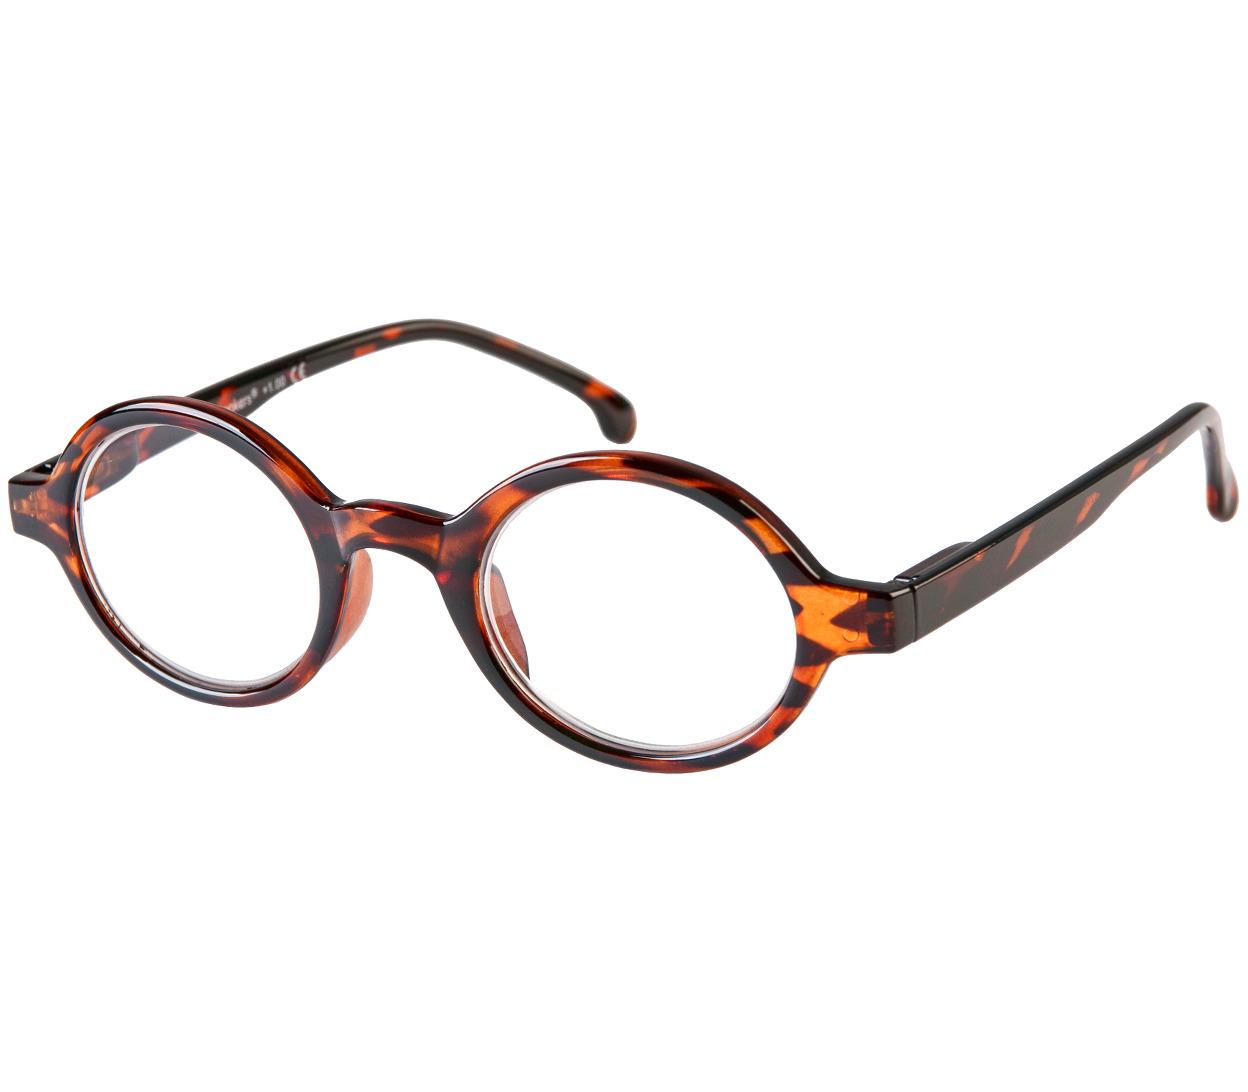 19b32765daf Main Image (Angle) - Kensington (Tortoiseshell) Reading Glasses ...